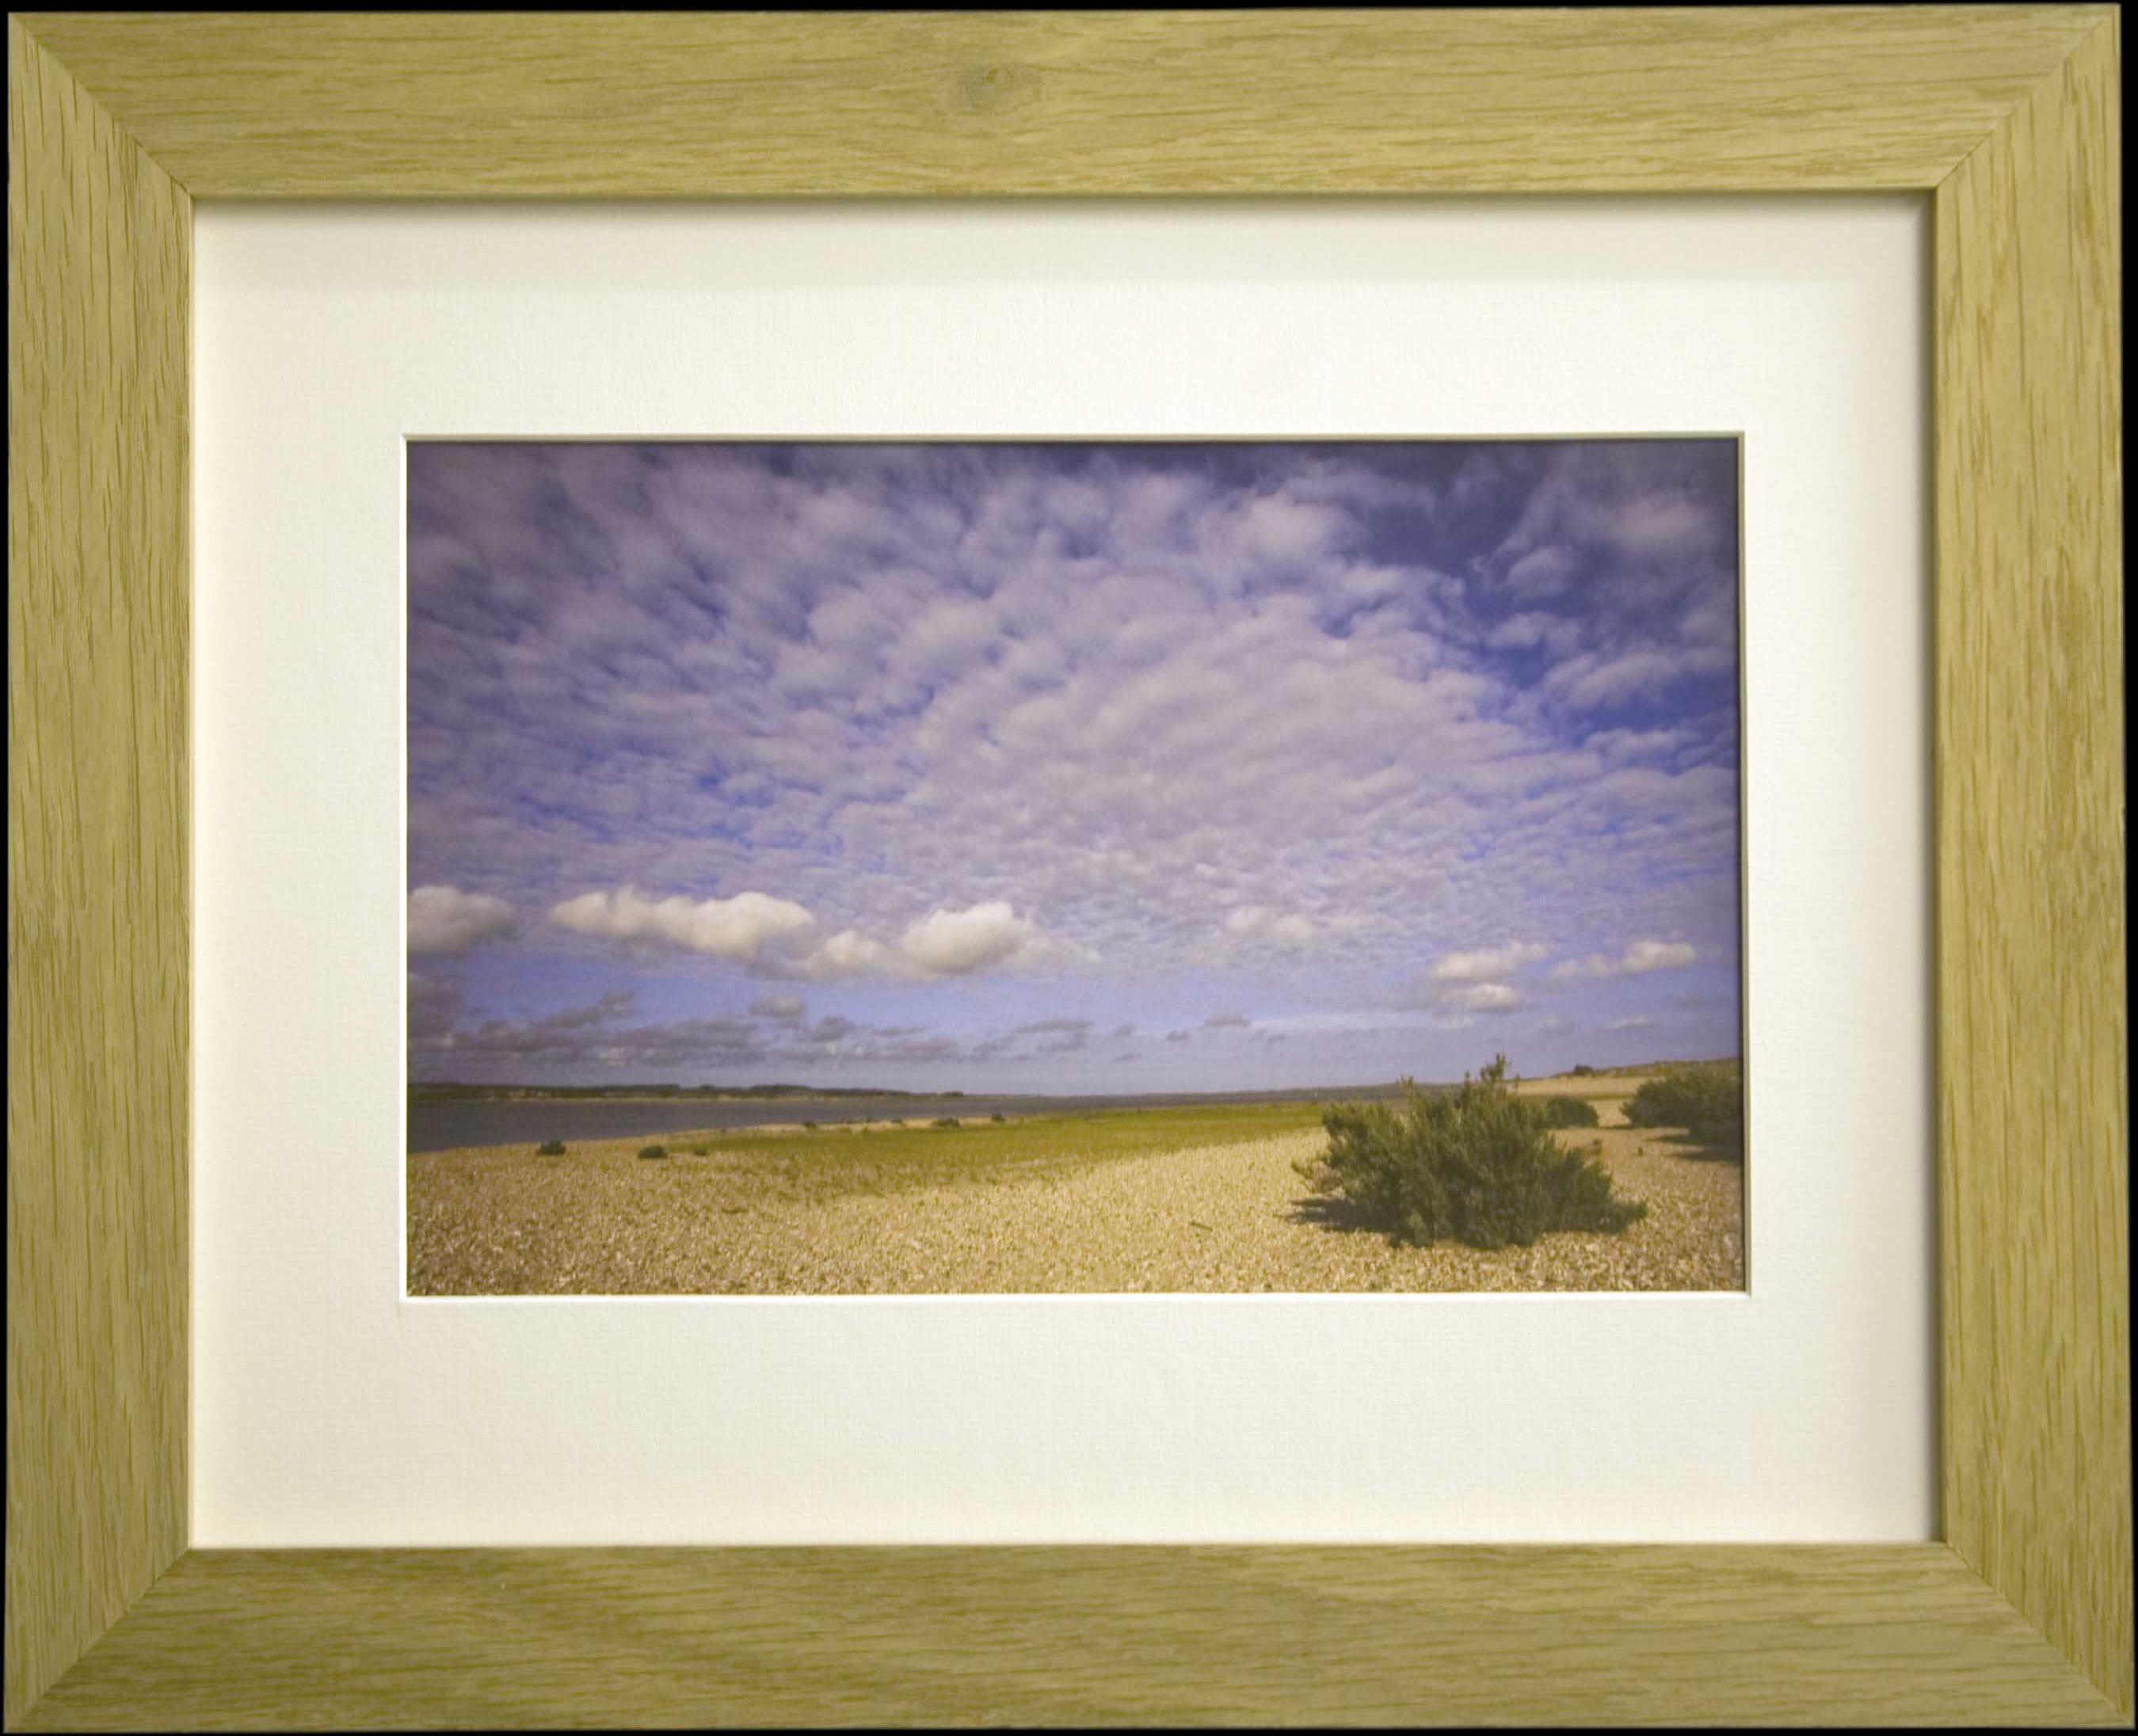 Pictures framed and delivered